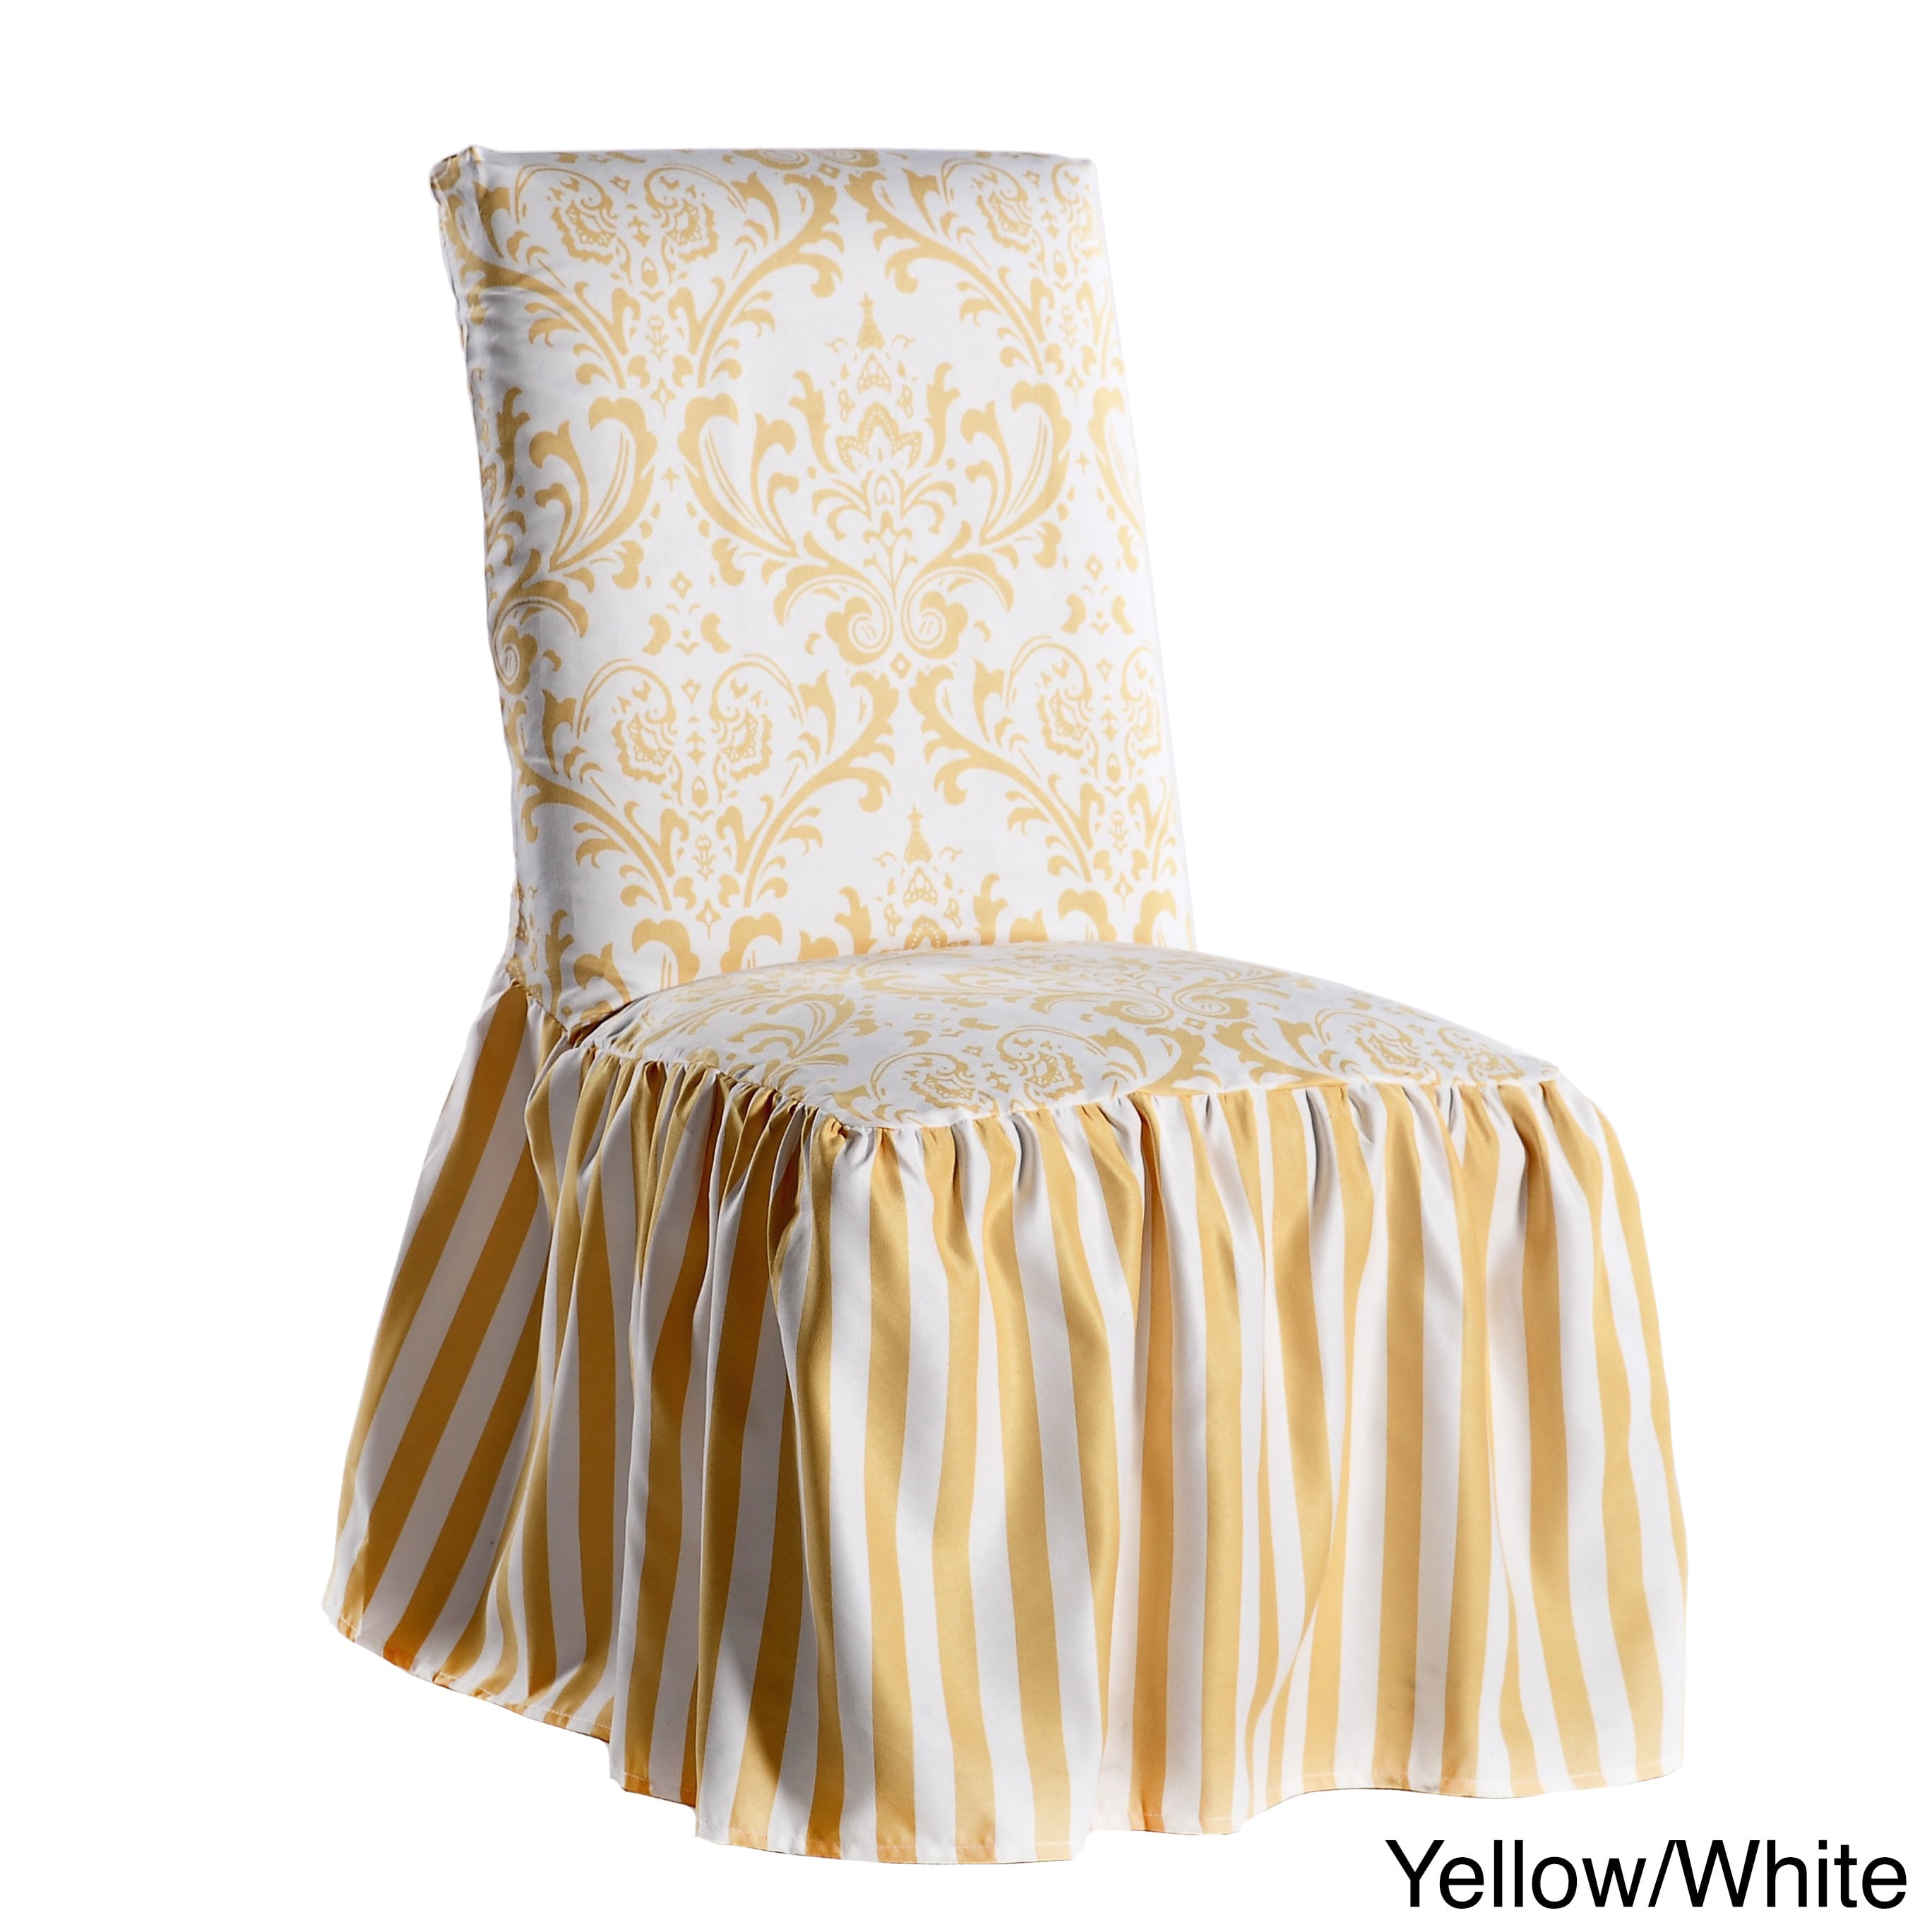 Stripe Dining Chair Slipcover Set